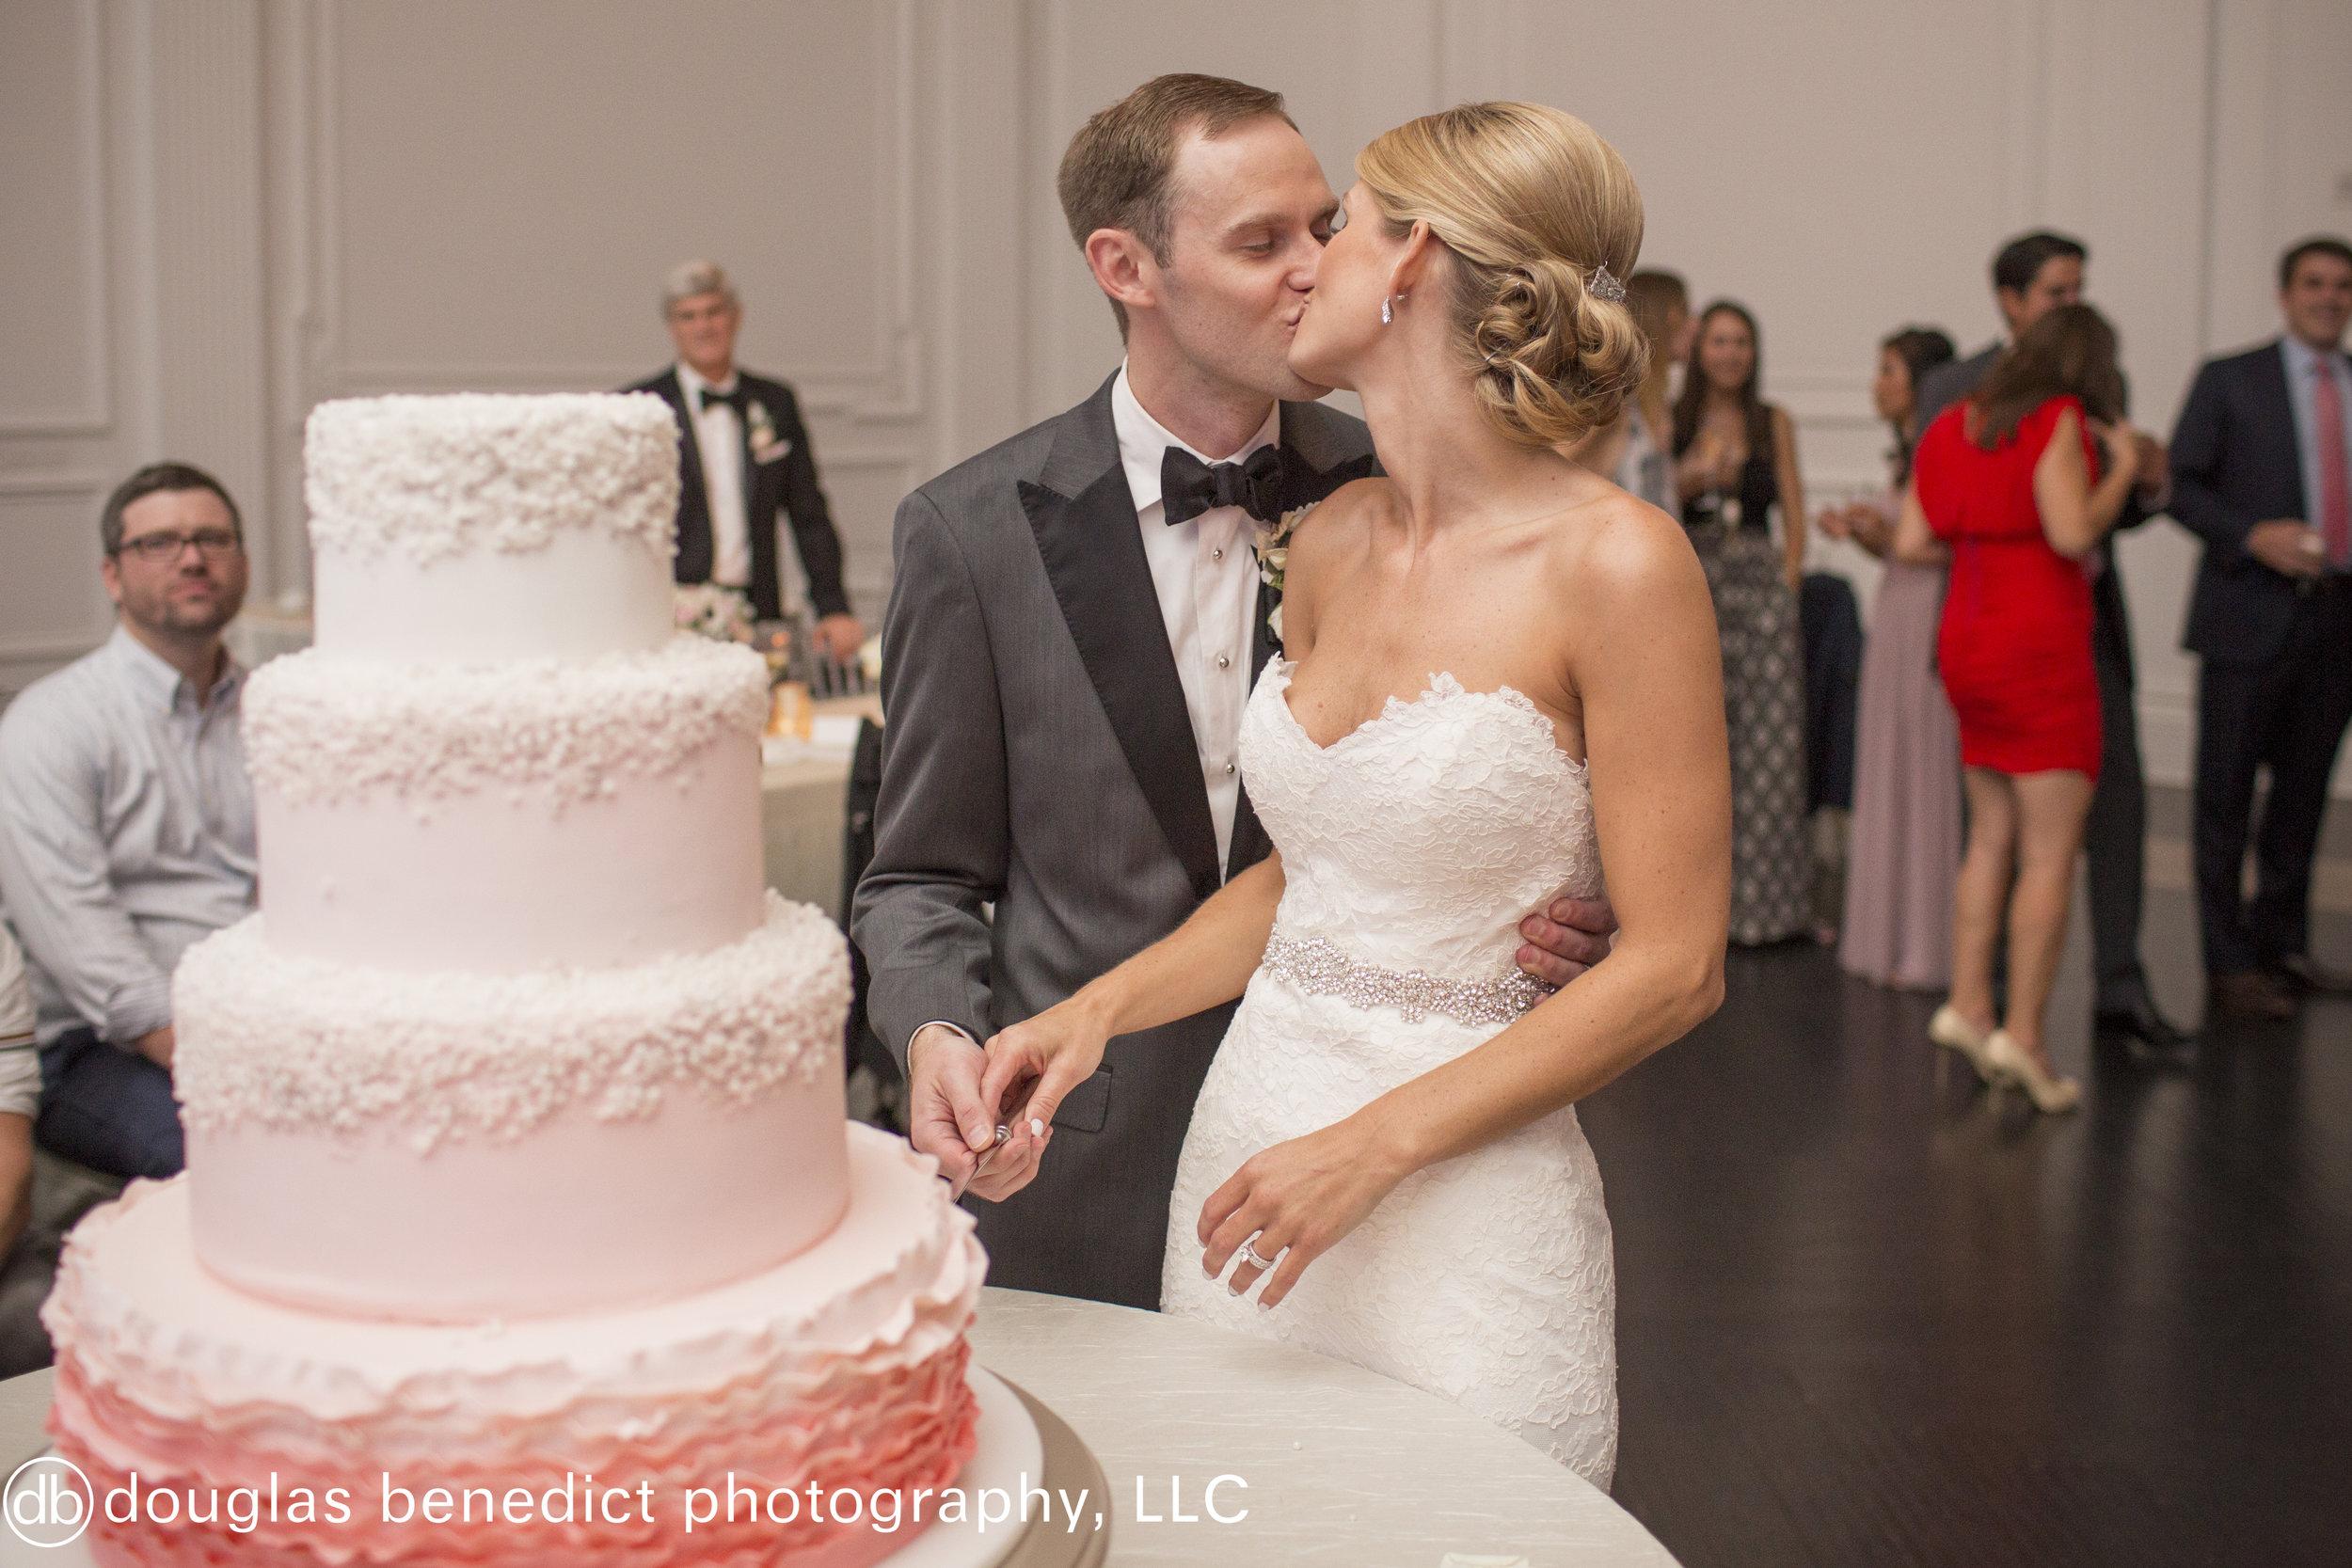 38 Downtown Club Philadelphia Wedding Cake Cutting.jpg